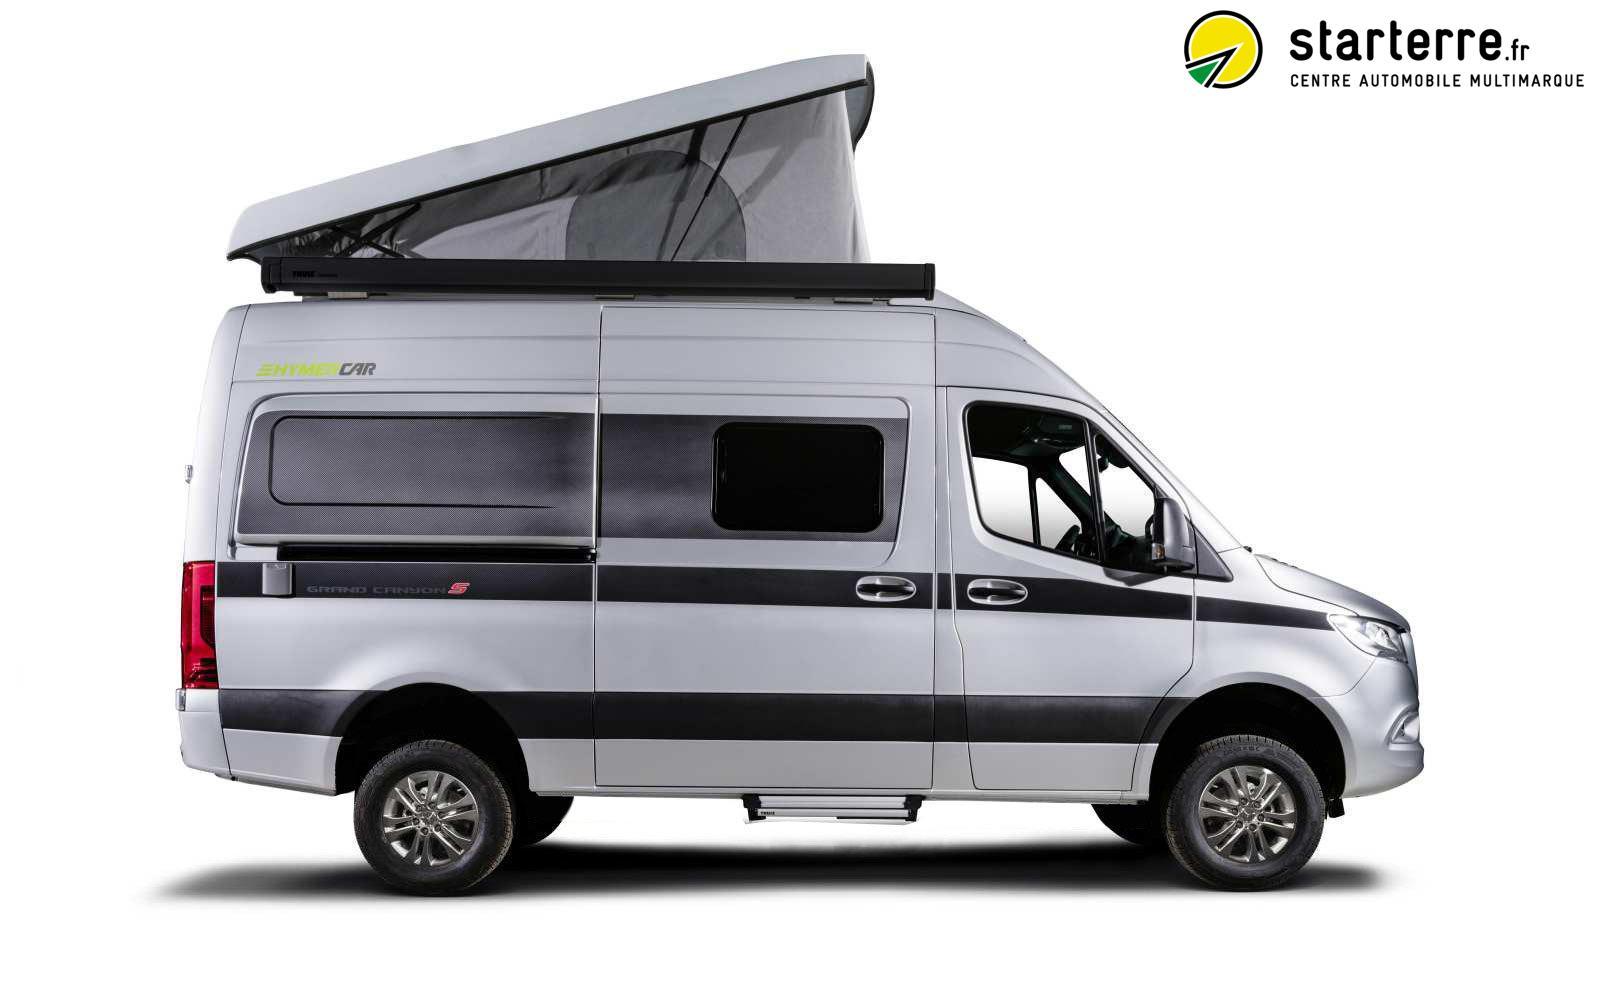 hymer car grand canyon s 2019 4x4 new mercedes sprinter 316 cdi 163 cv 4x4 11811834. Black Bedroom Furniture Sets. Home Design Ideas